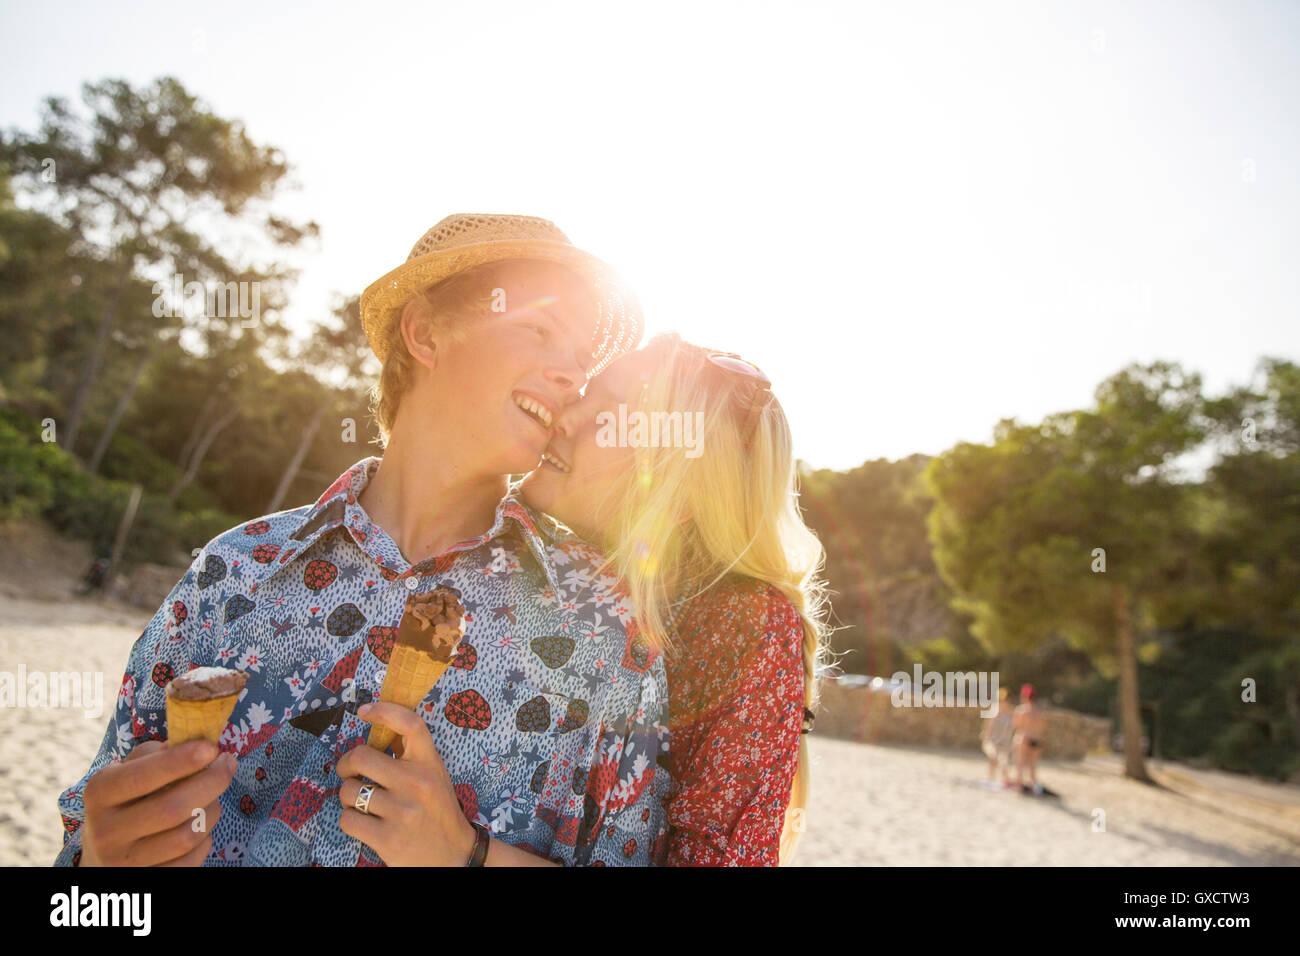 Par la celebración de conos de helado abrazo, Mallorca, España Imagen De Stock